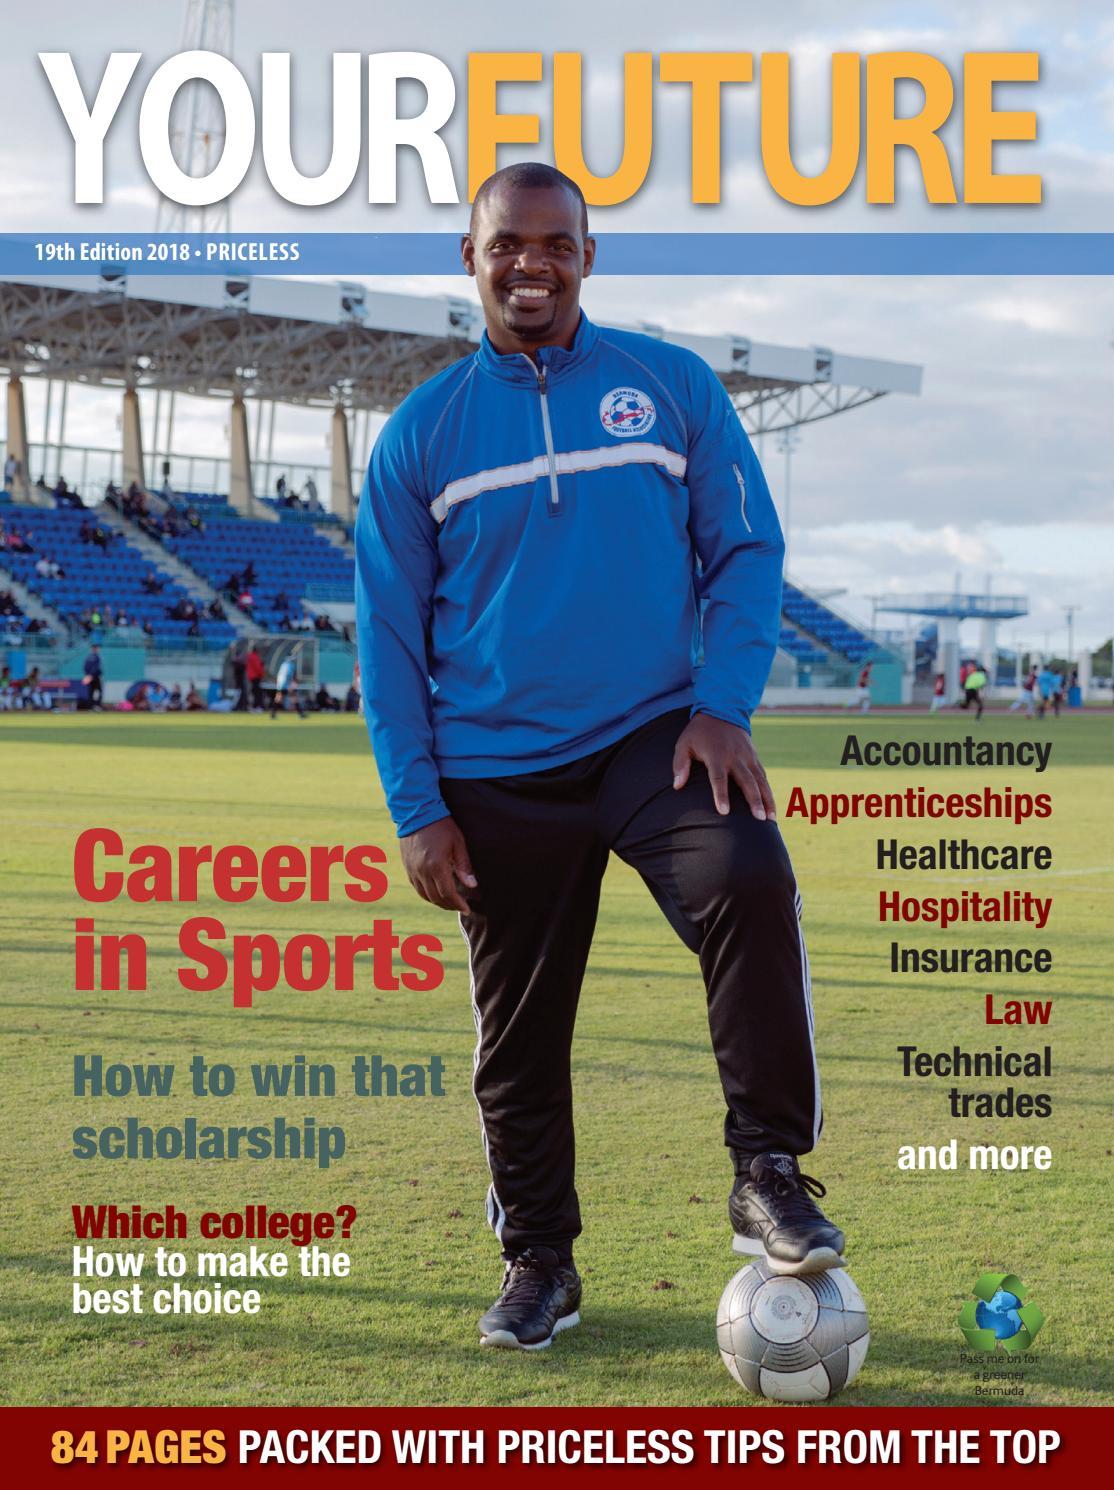 Your Future 2018 by Bermuda Media